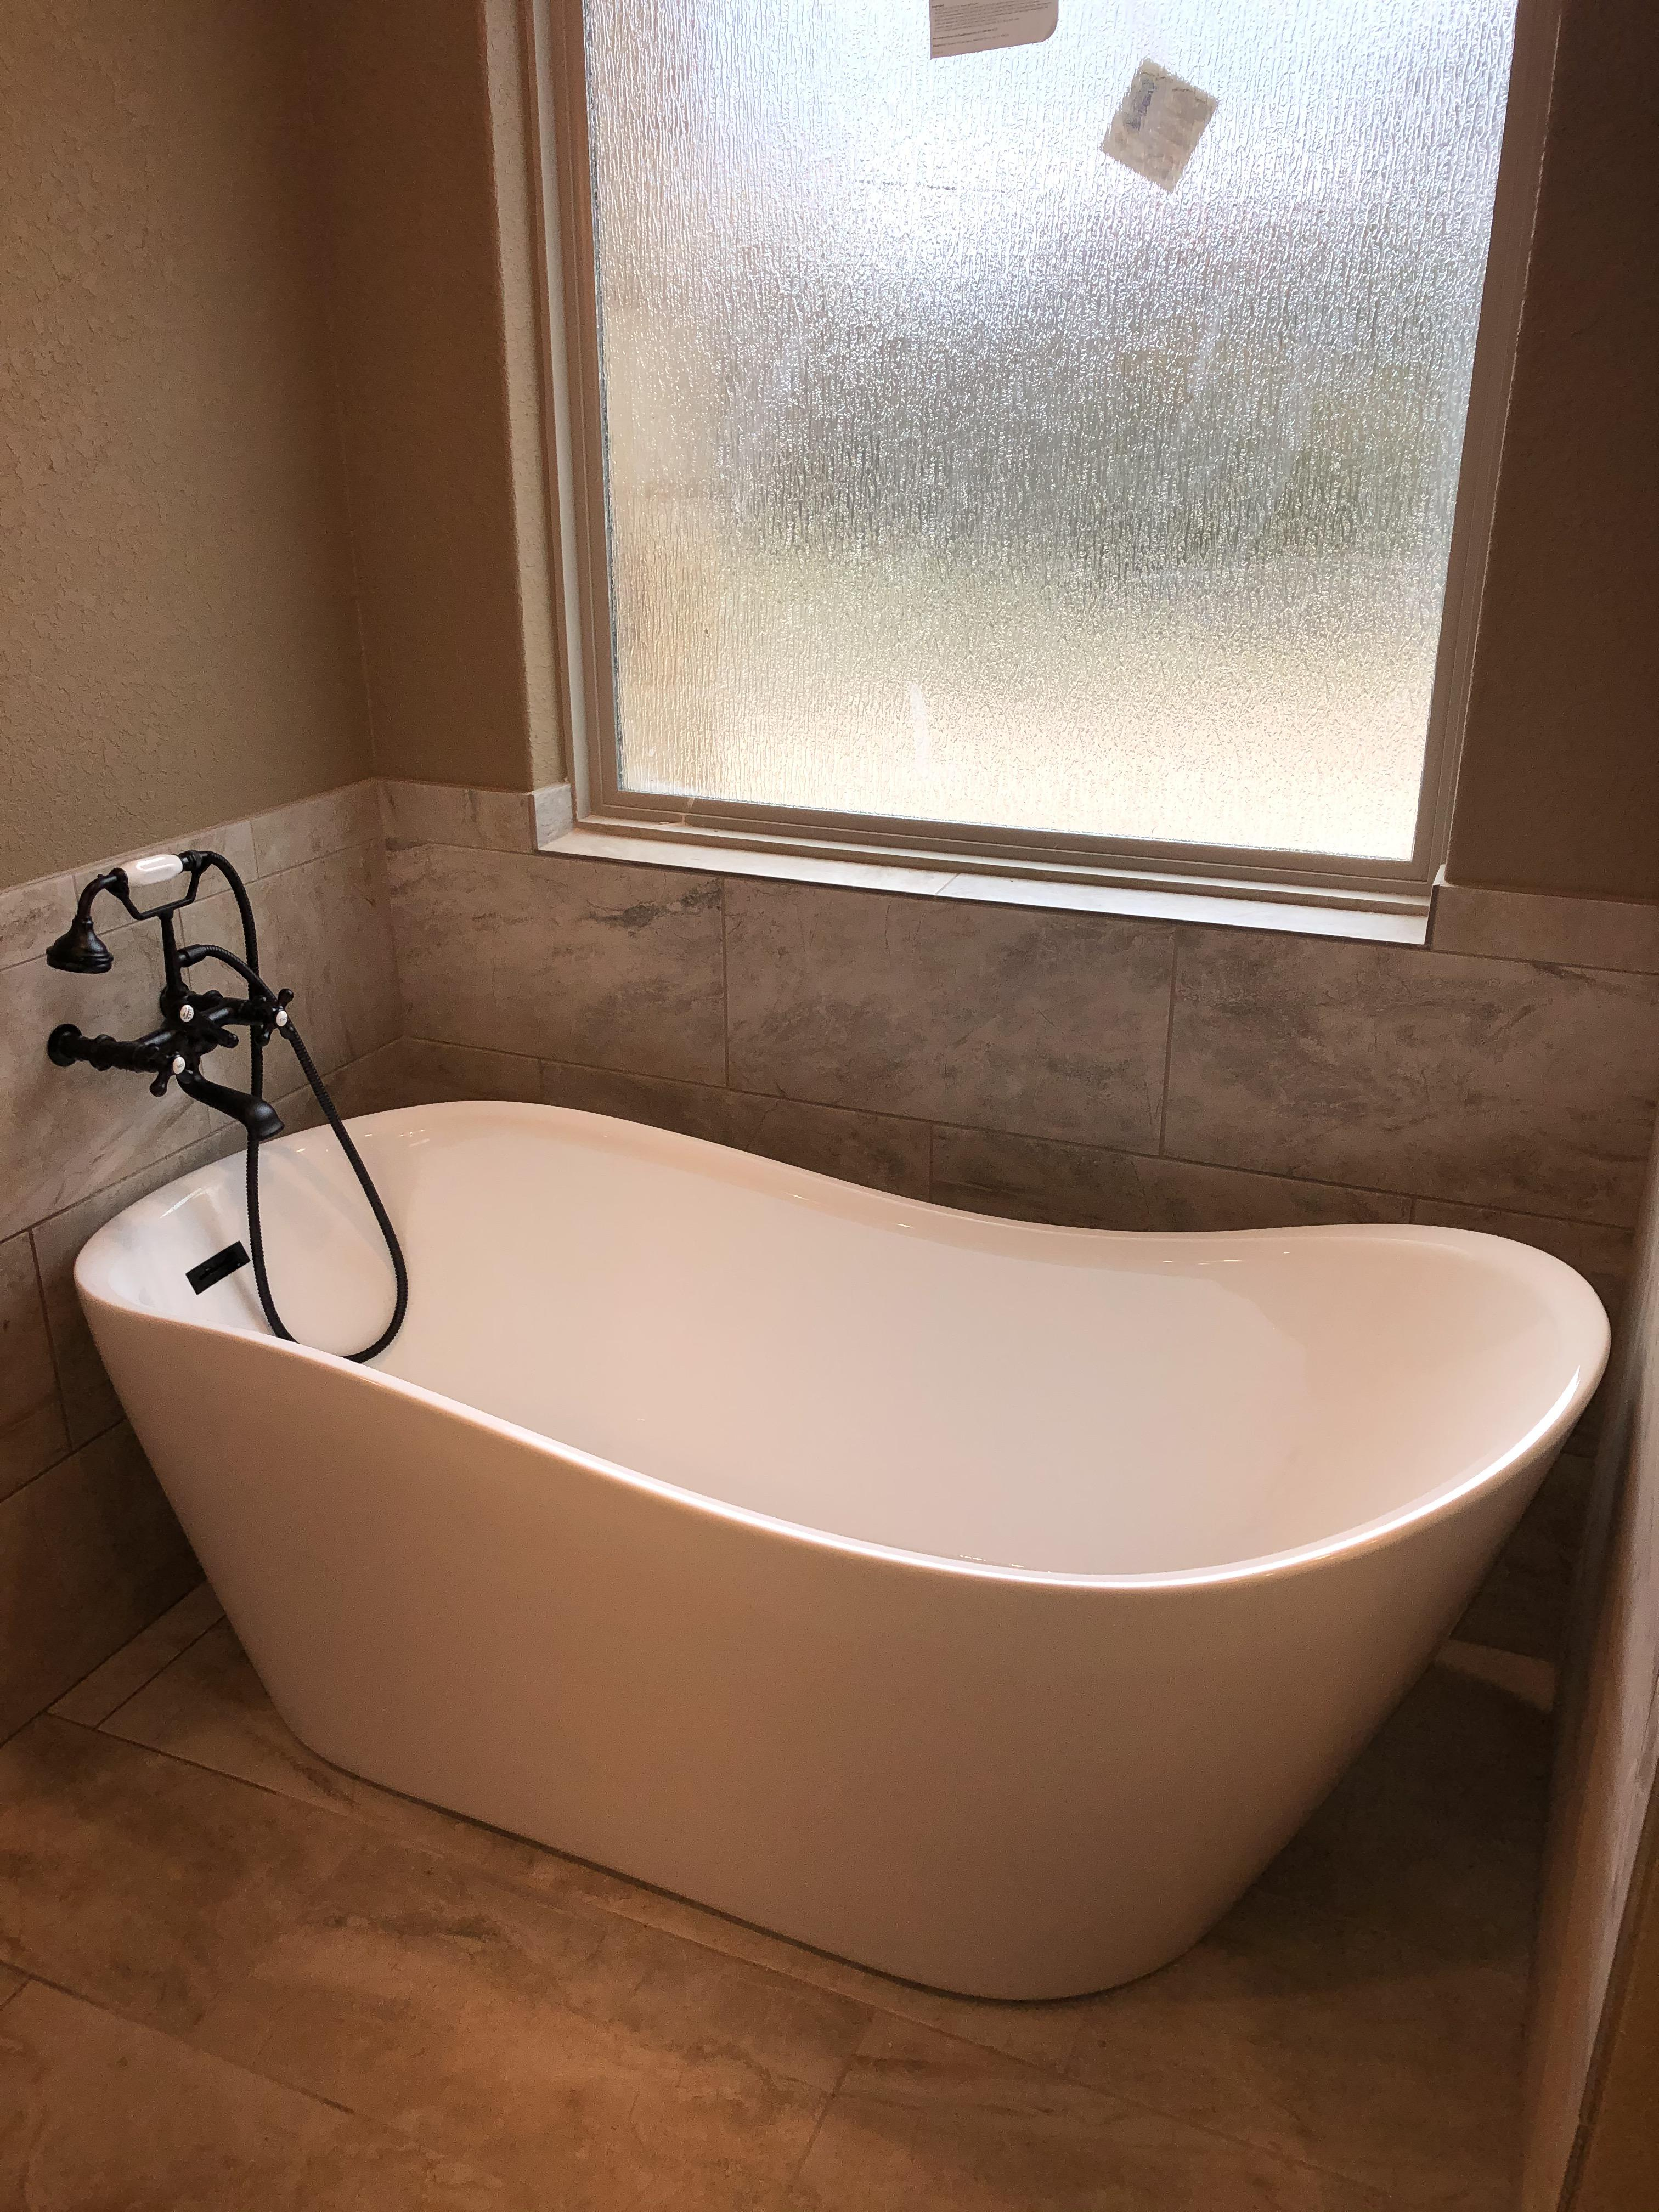 wall mounted faucet got